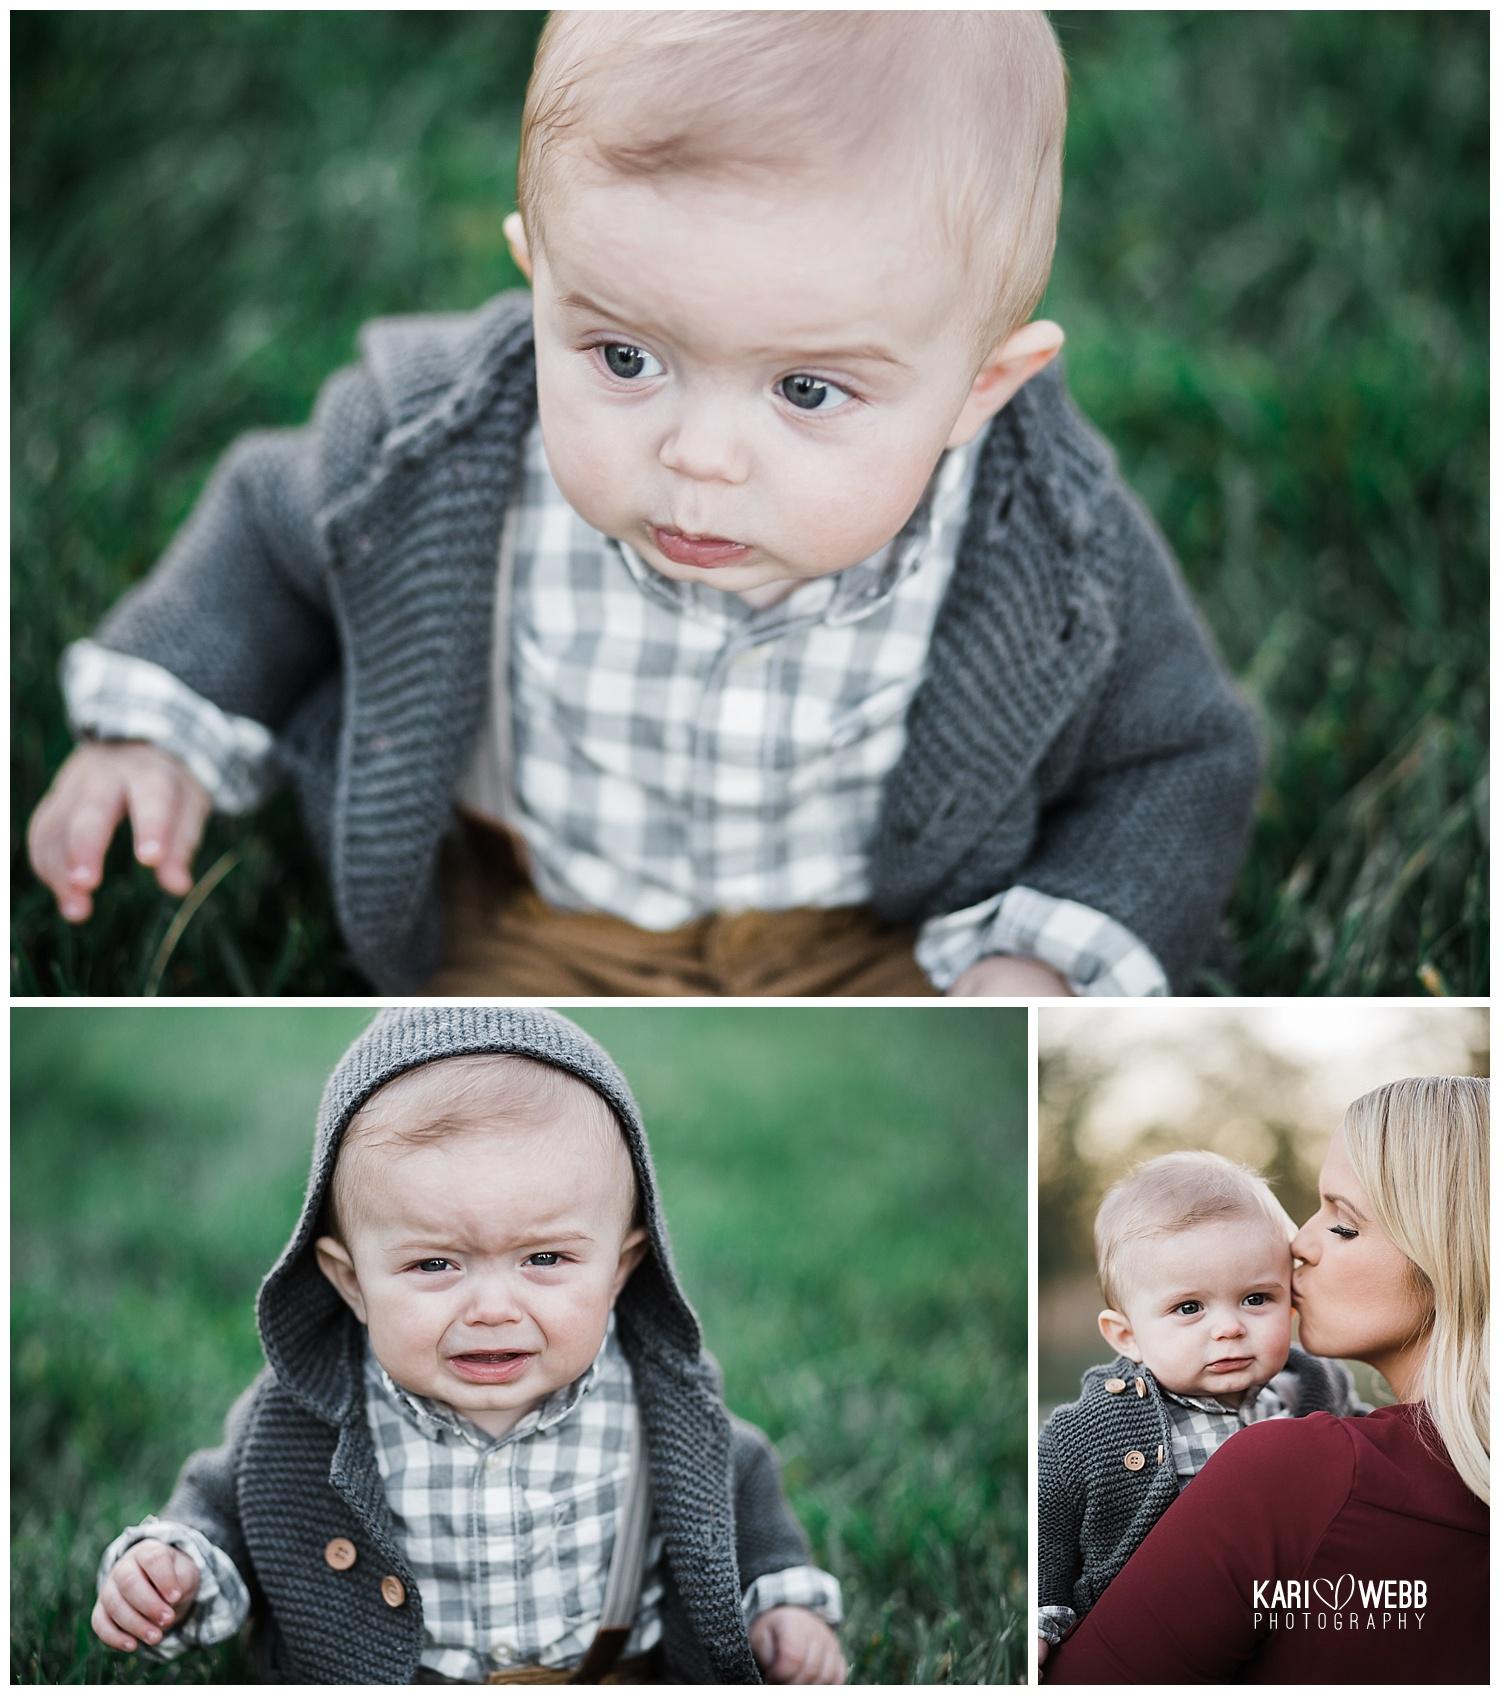 Kari Webb Photography_Irvine Family Photographer_ baby in a hood crying looking cute.jpg